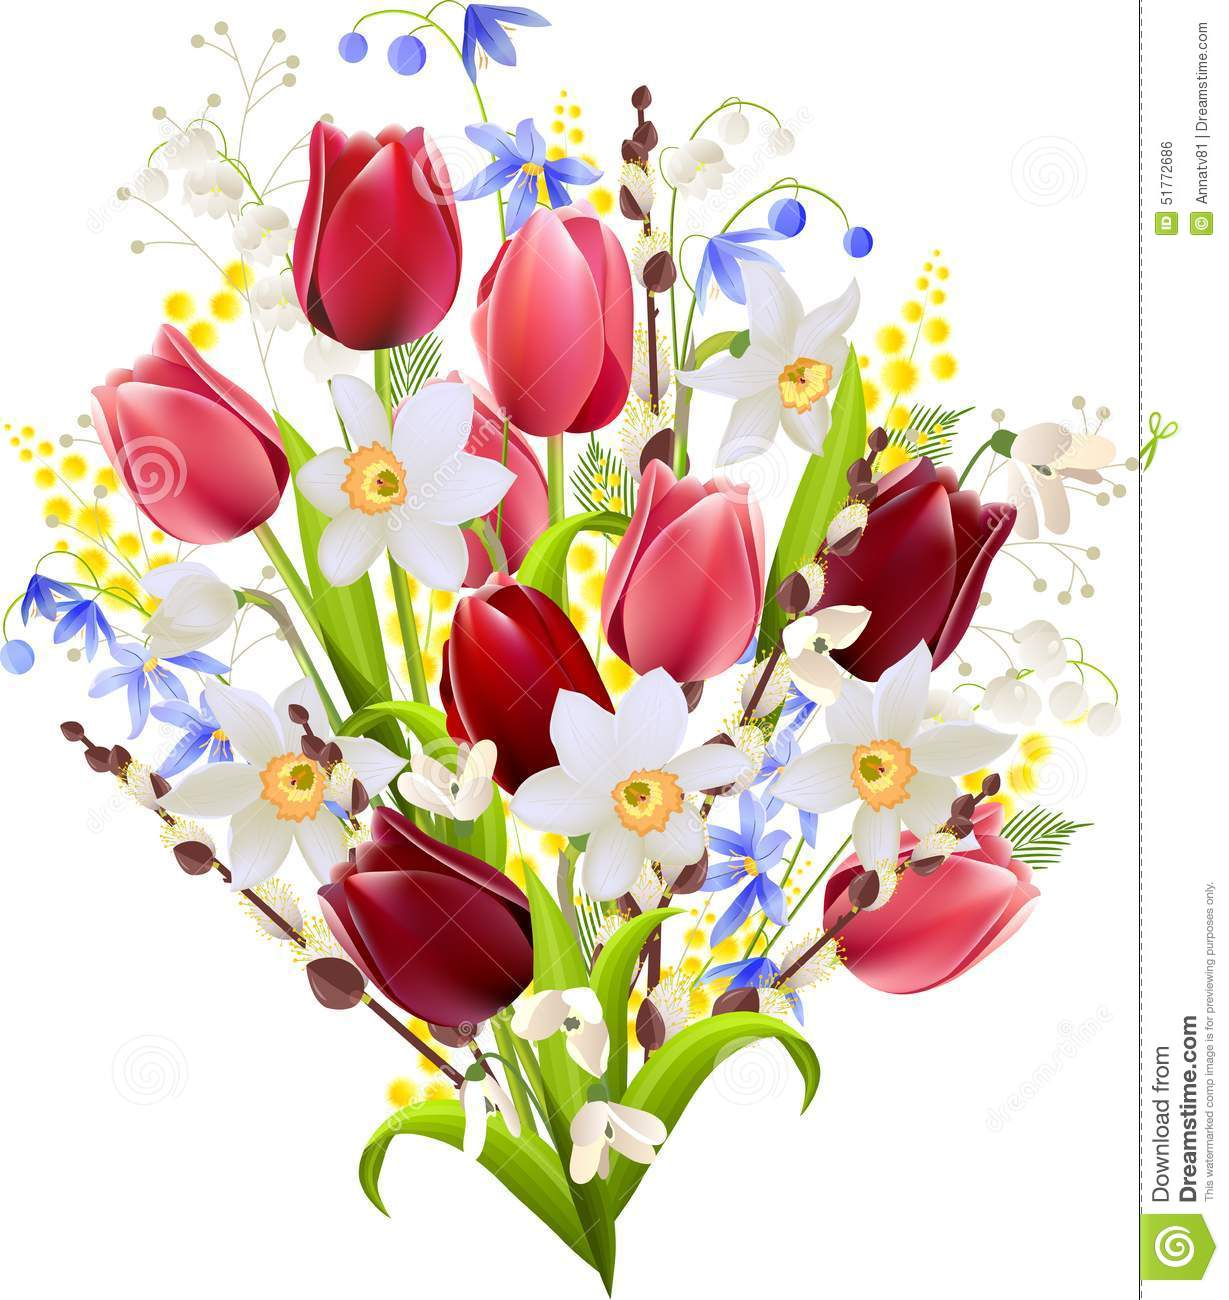 Big bunch of flowers image jpg free Big Bunch Of Spring Flowers Stock Vector - Image: 51772686 jpg free